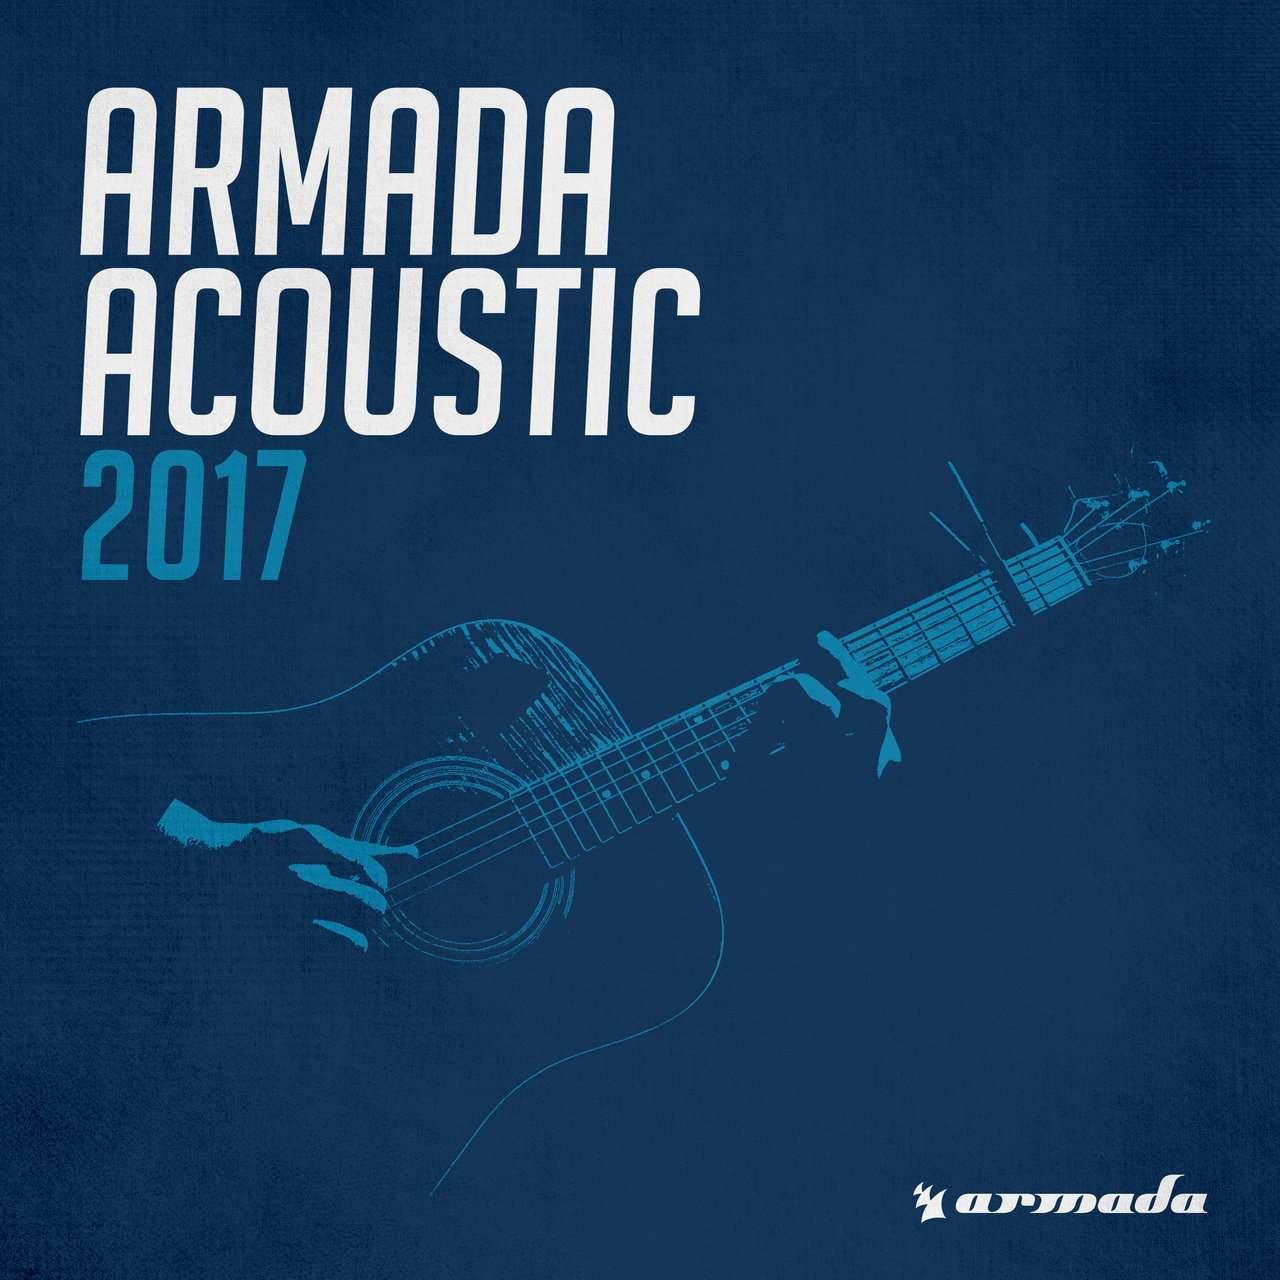 Armada《Armada Acoustic 2017》[CD级无损/44.1kHz/16bit]